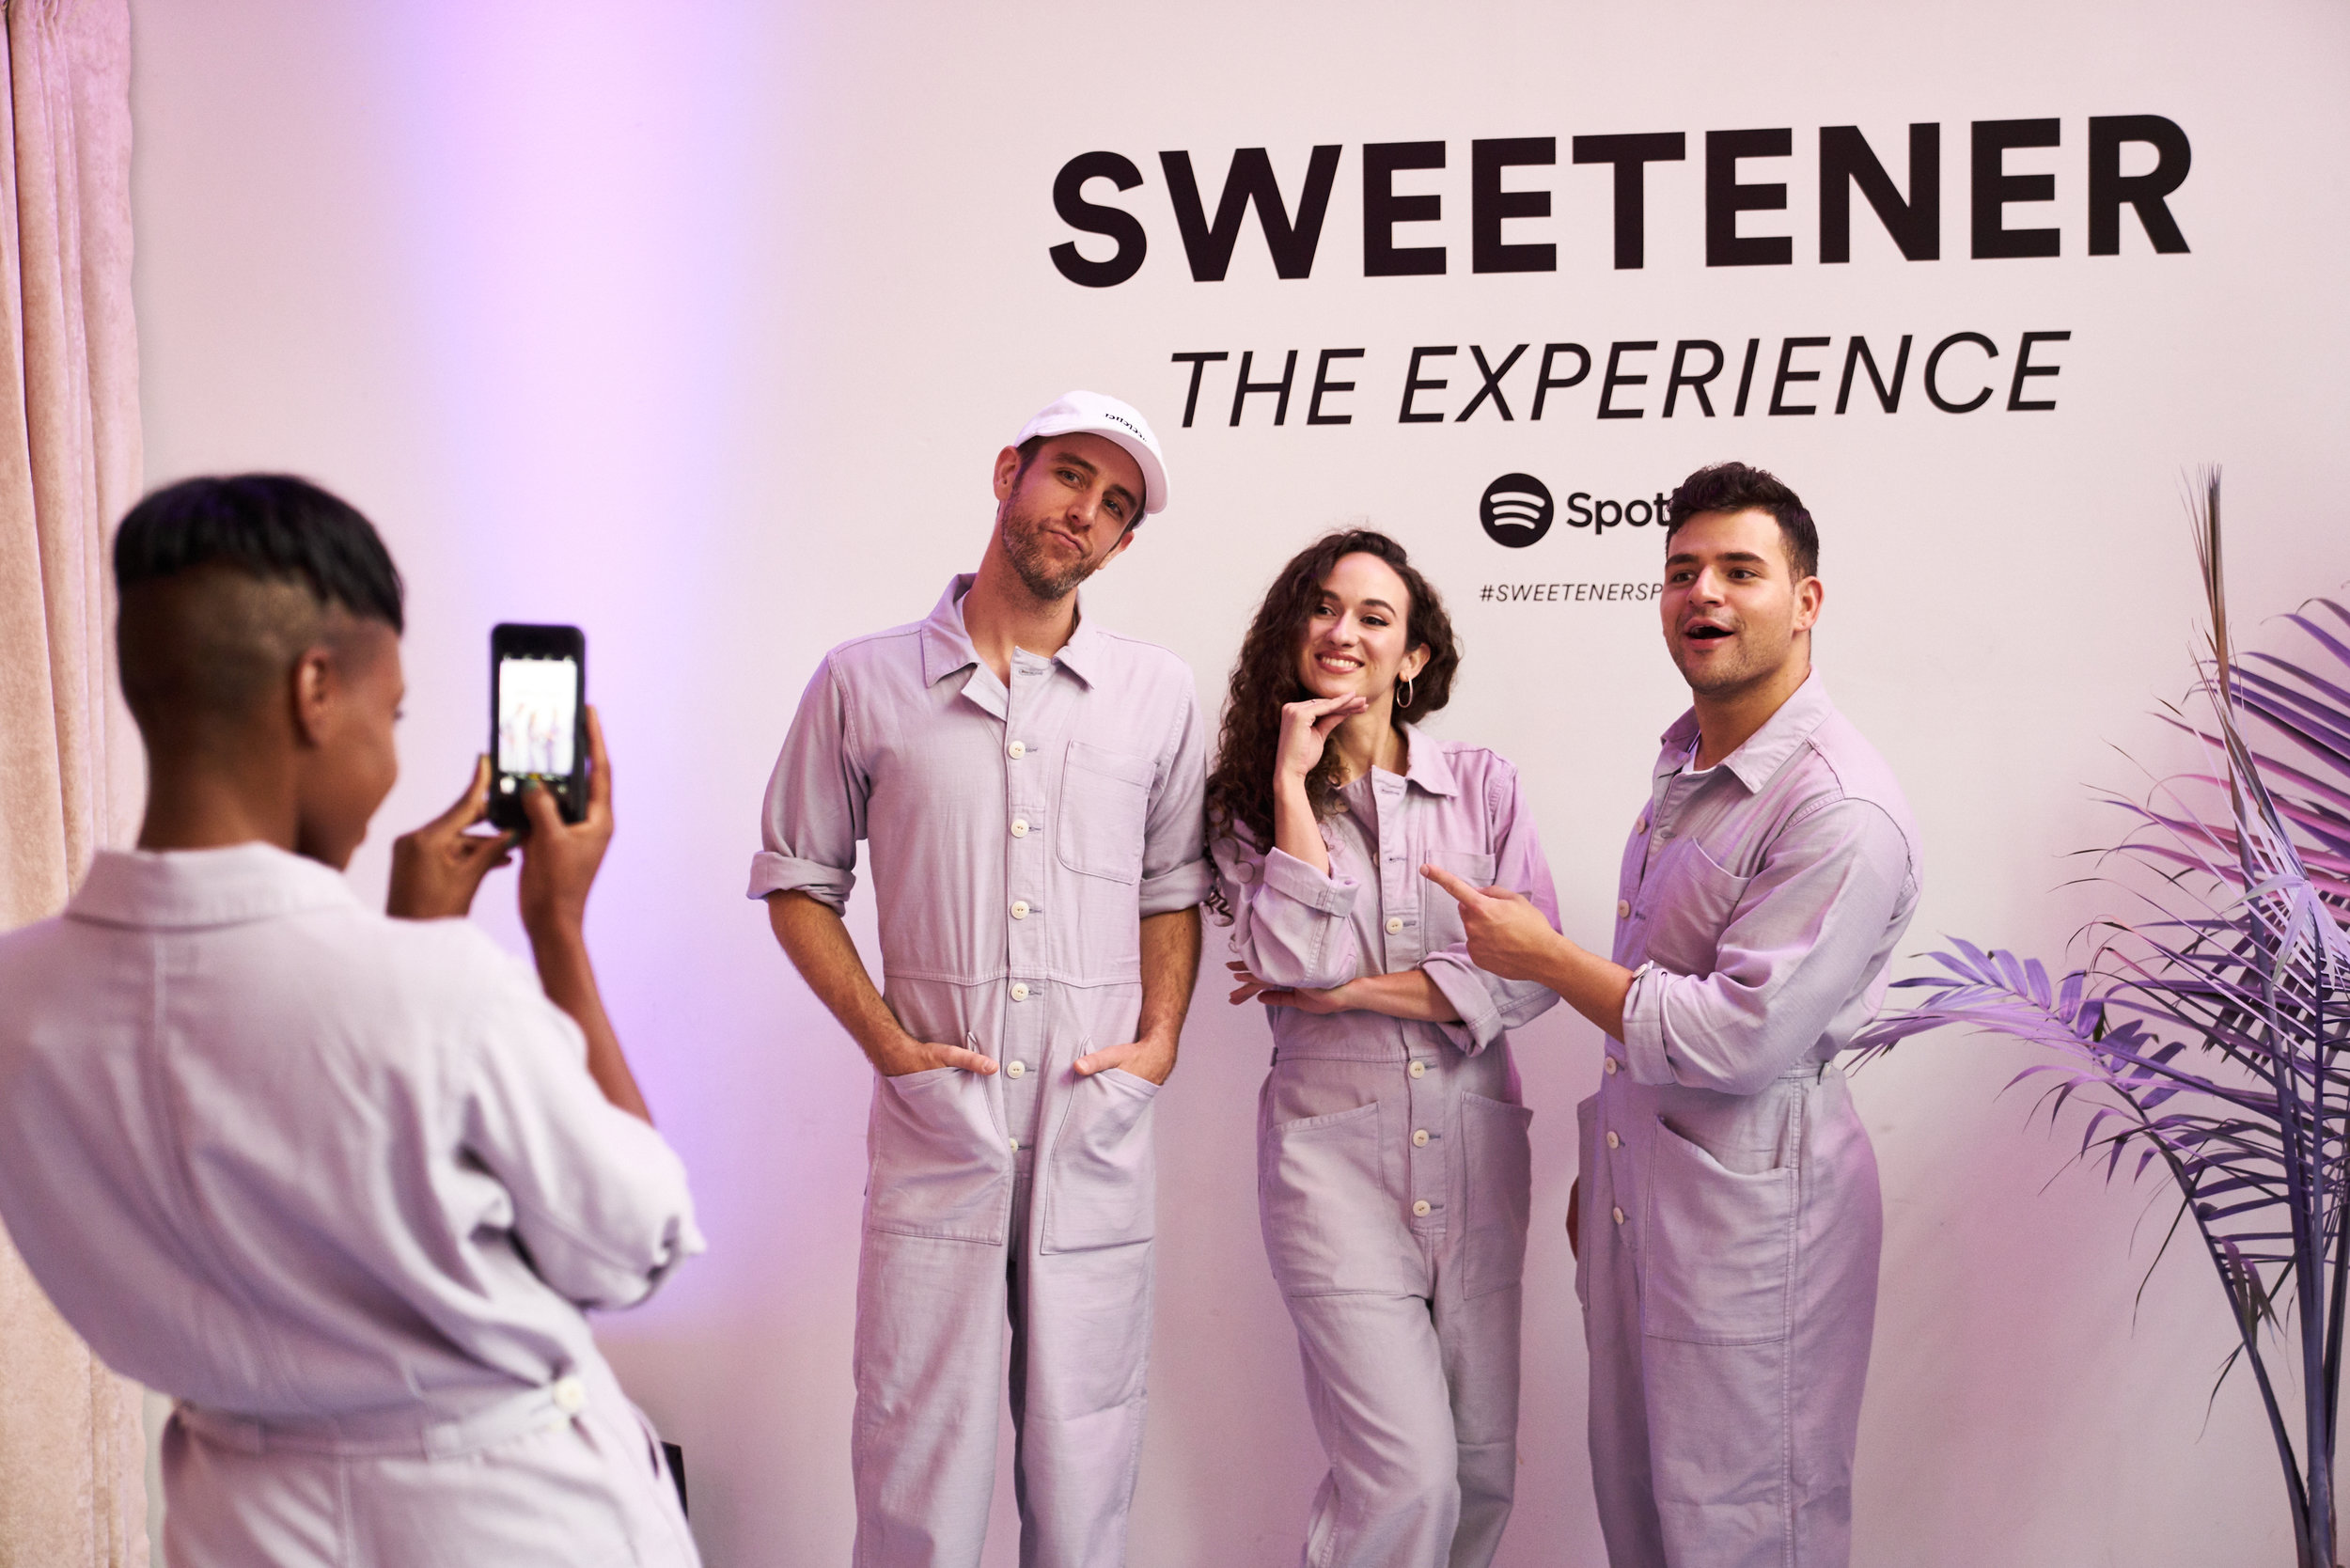 AG_Spotify_Sweetener Extras_131.jpg